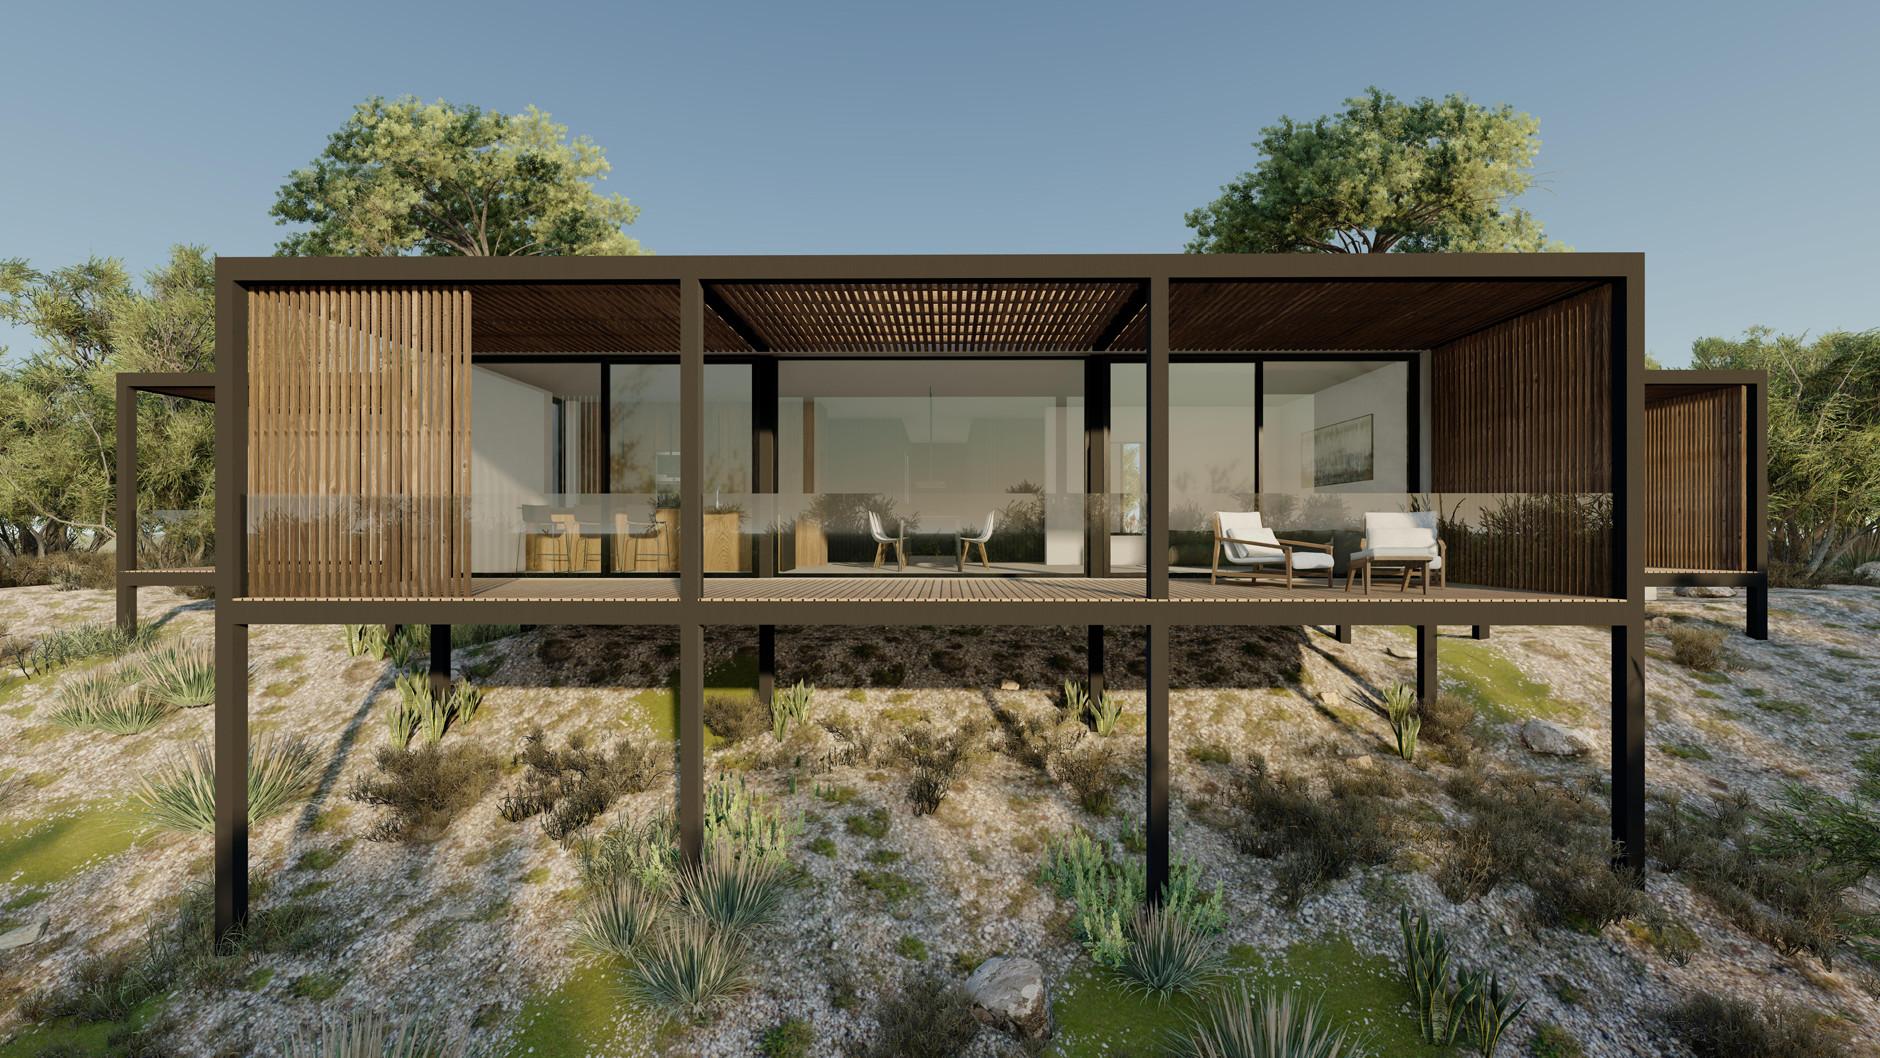 prefab-wood-structure-sustainable-house-zest-architecture